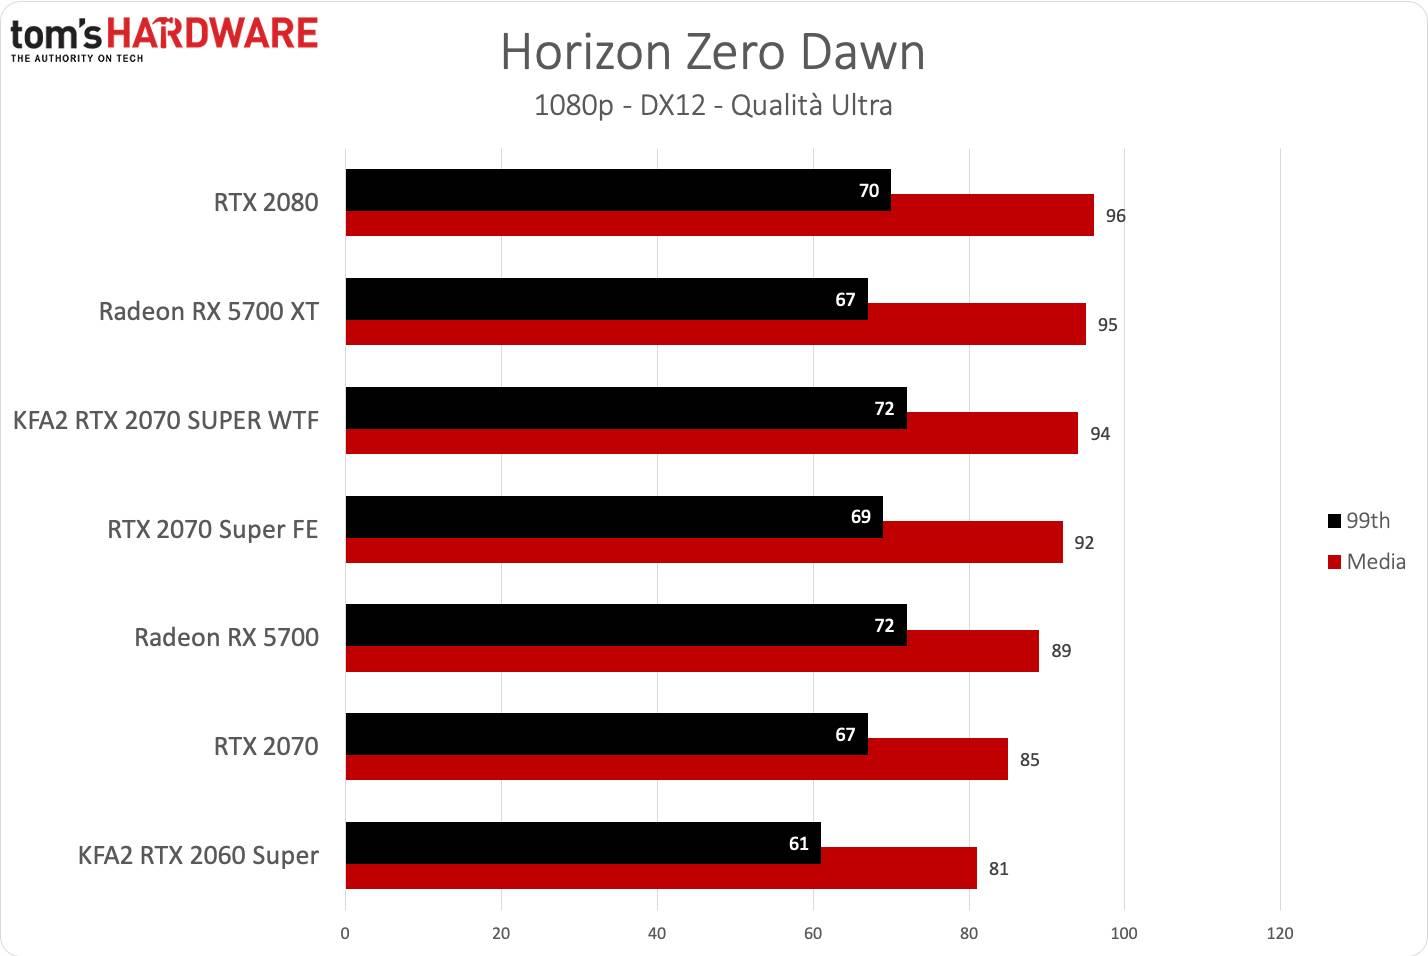 KFA2 RTX 2070 SUPER WTF - Horizon FHD